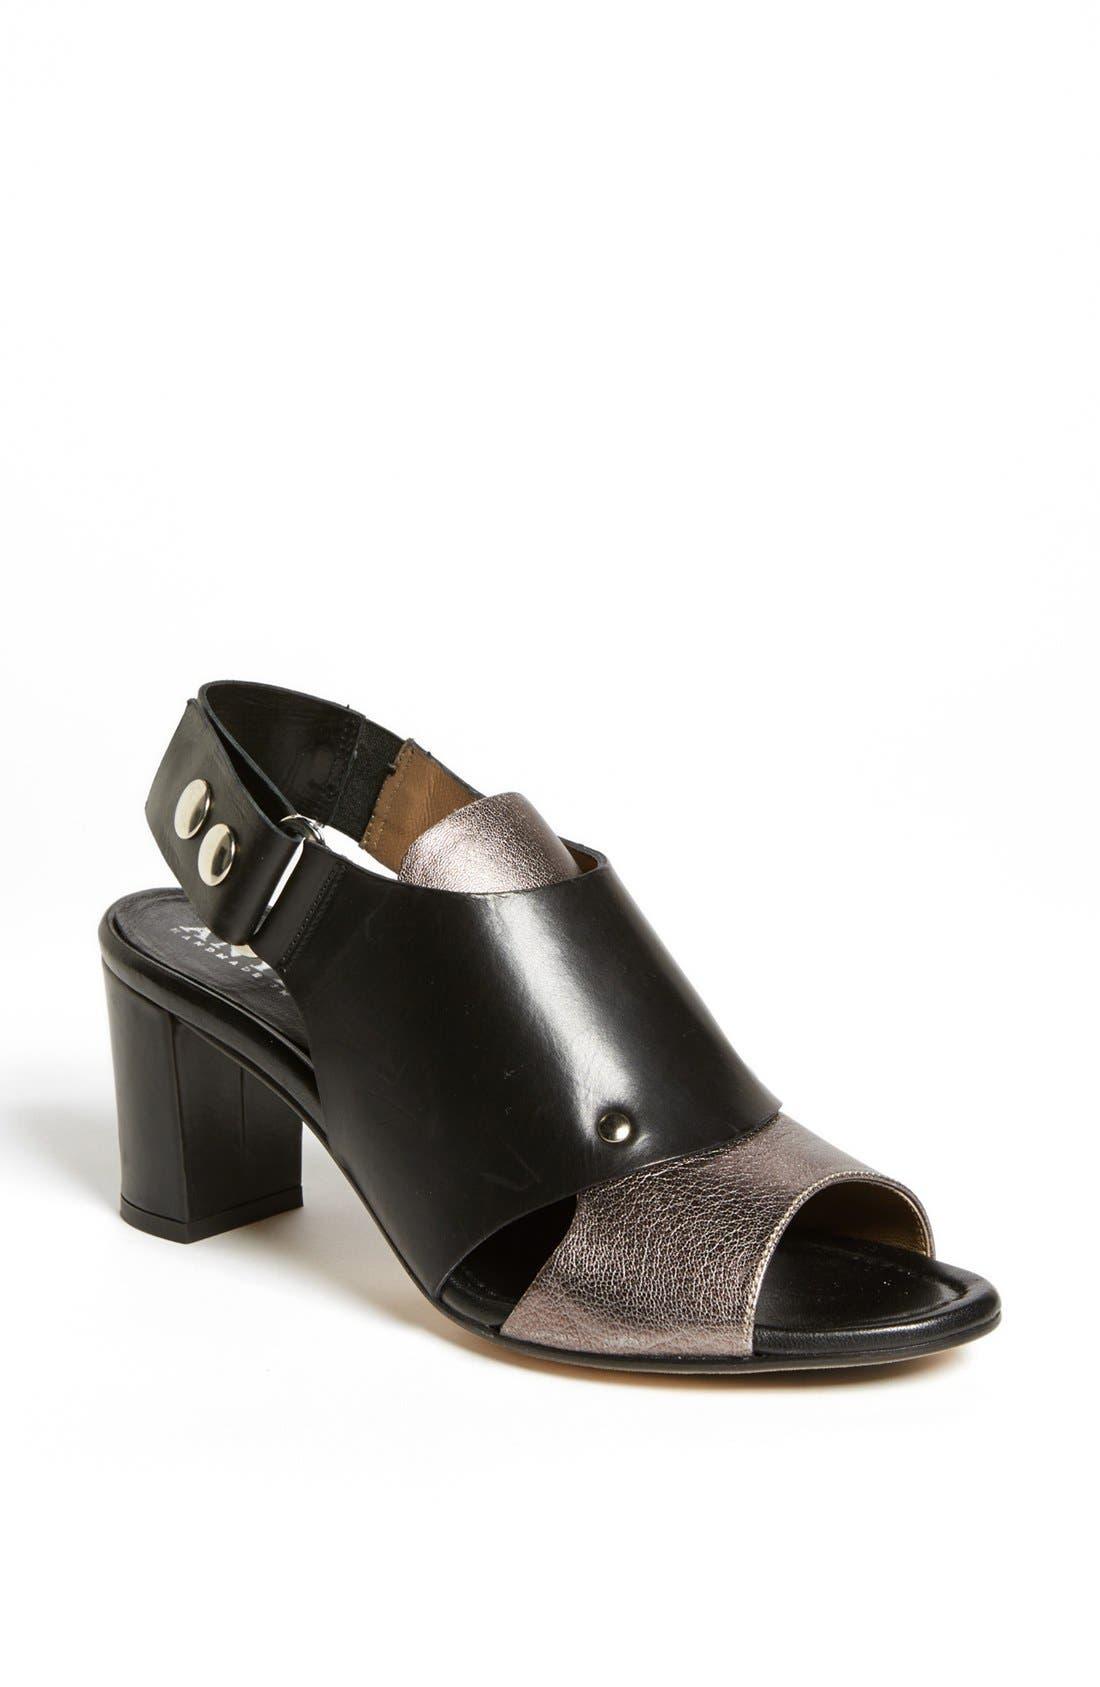 Main Image - Anyi Lu 'Athena' Sandal